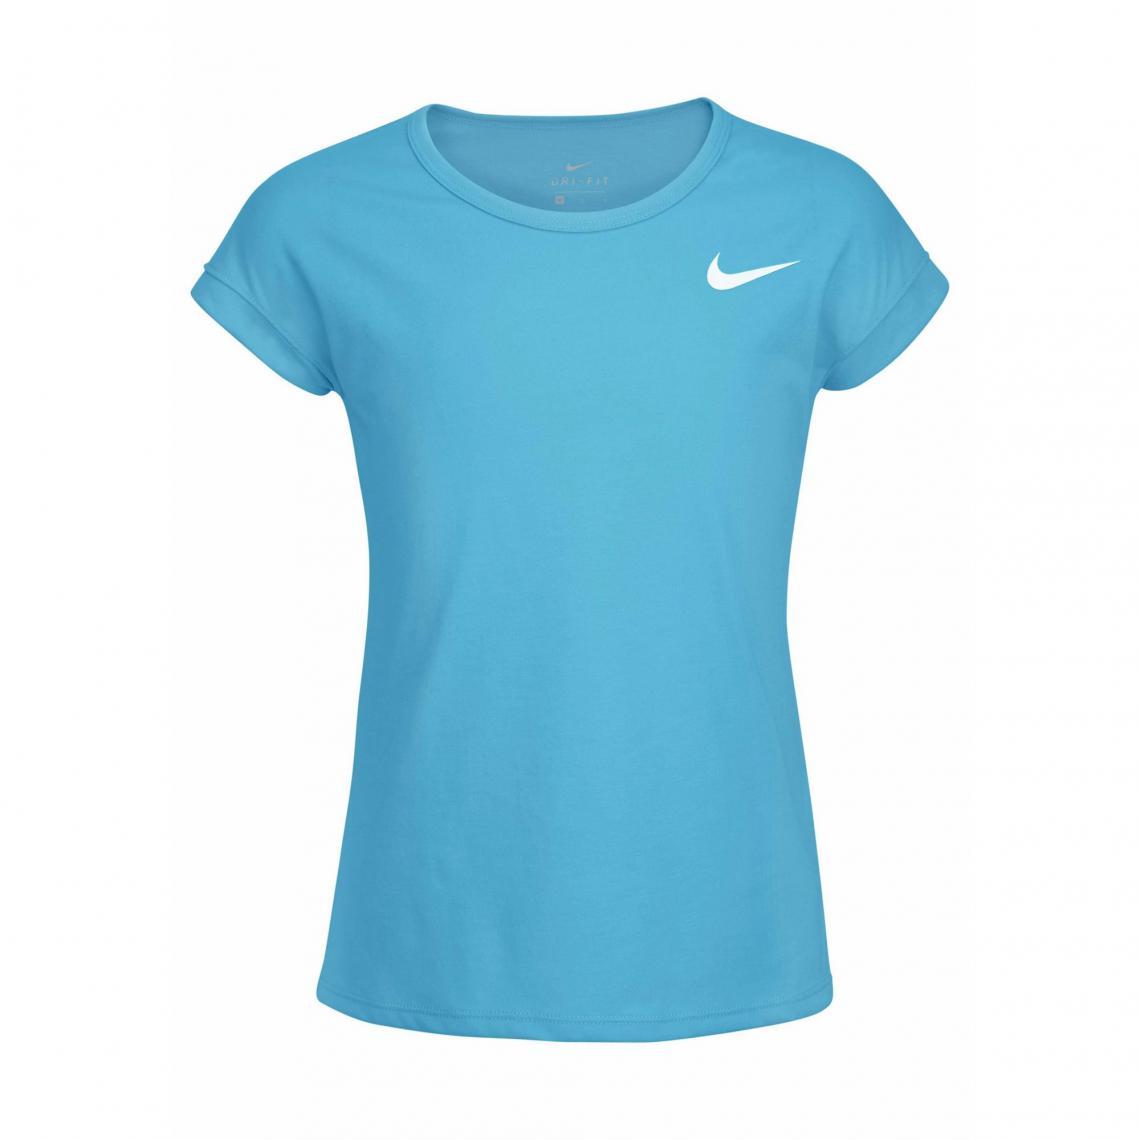 Tee-shirt col rond manches courtes fille Nike Dry - Bleu Nike edc4c25dbde